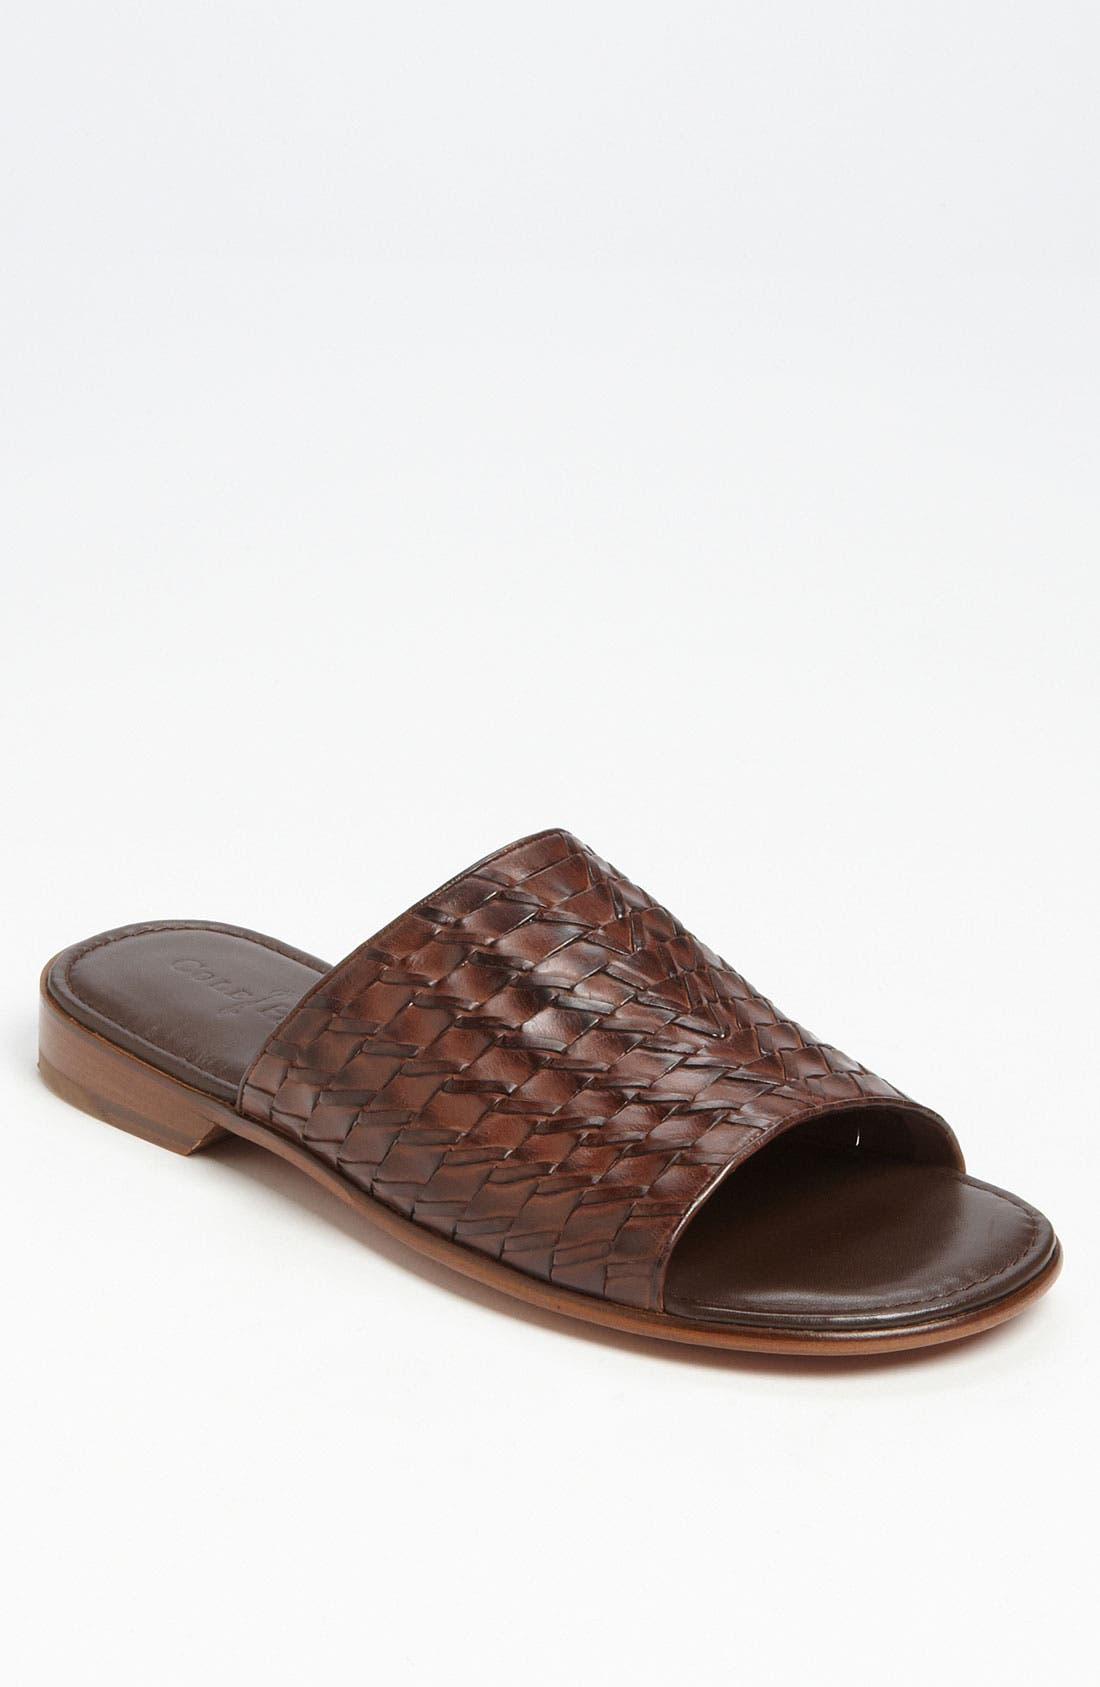 Main Image - Cole Haan 'Air Tremont' Sandal